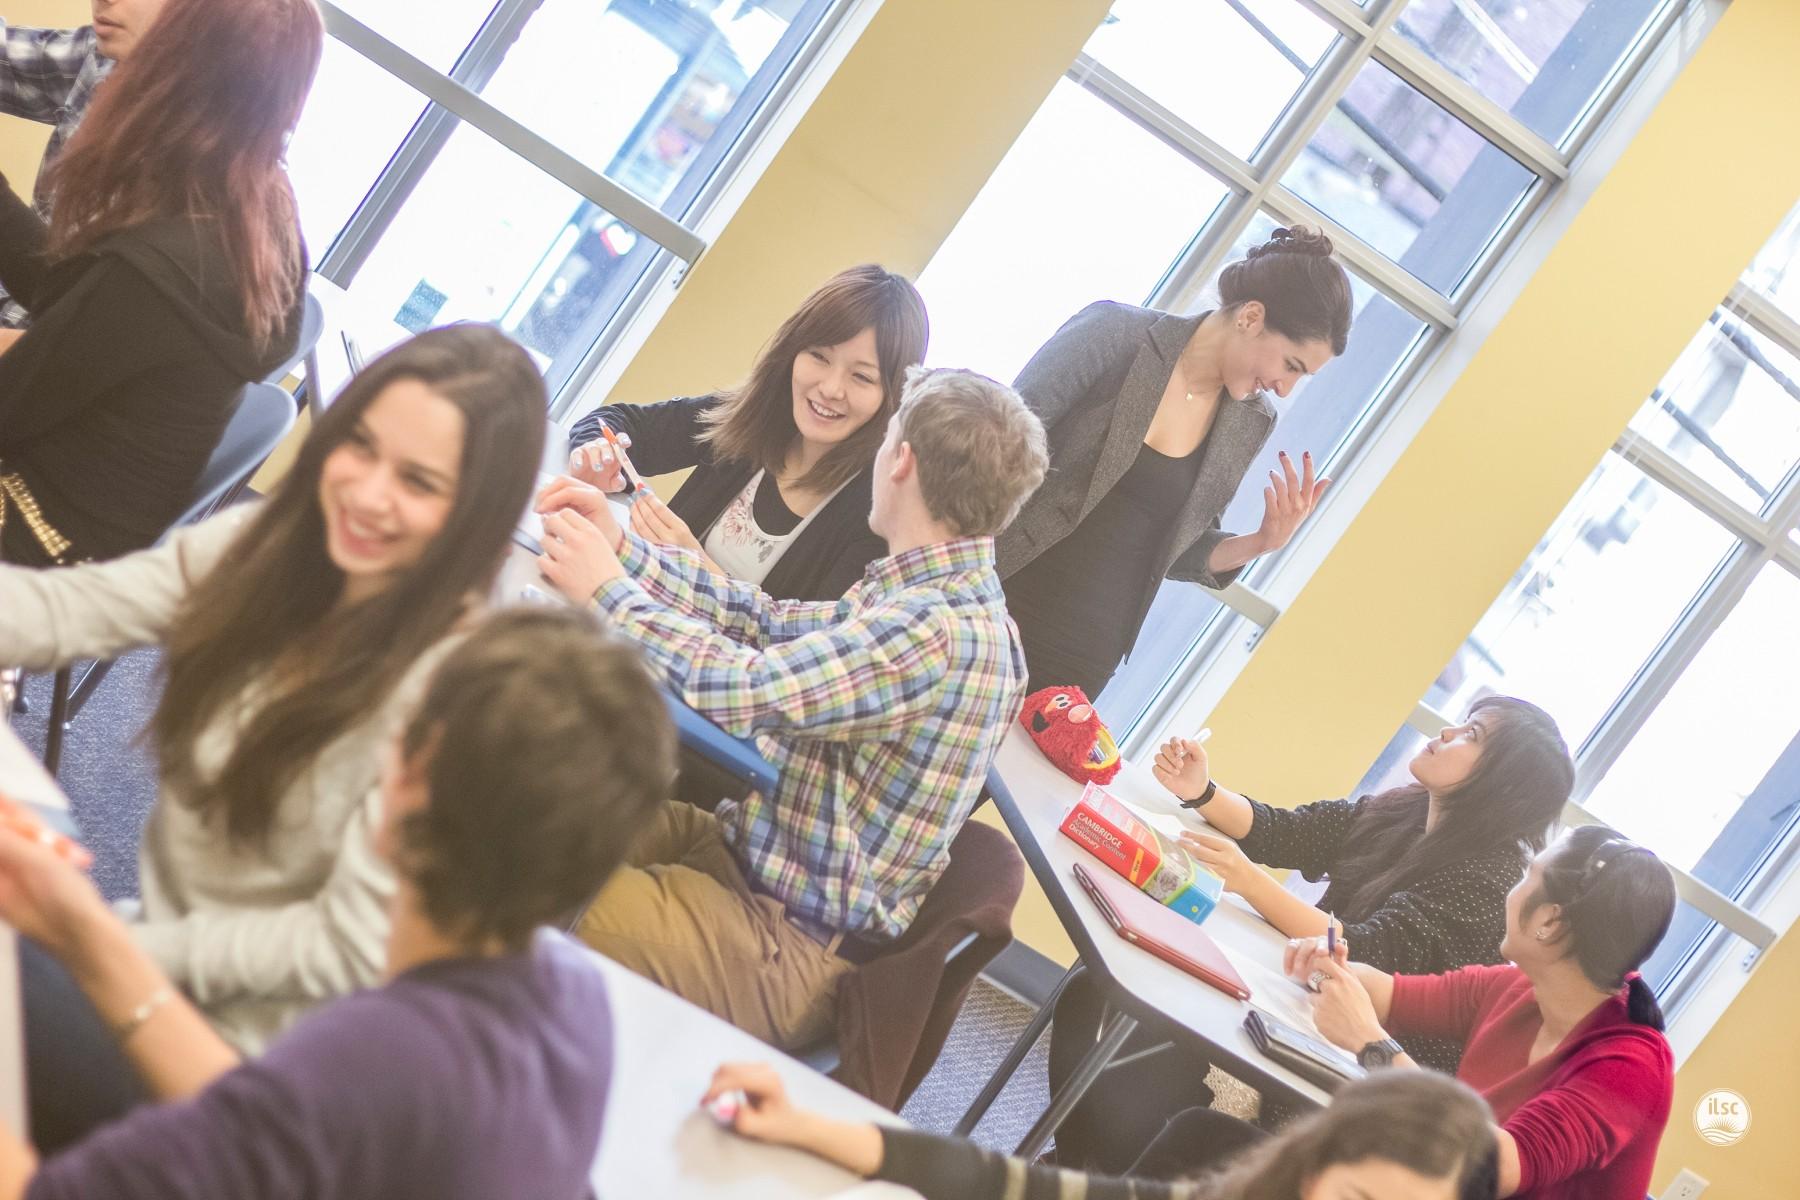 -agentsite-photo-list-ILSC-Vancouver-05_Classroom_03